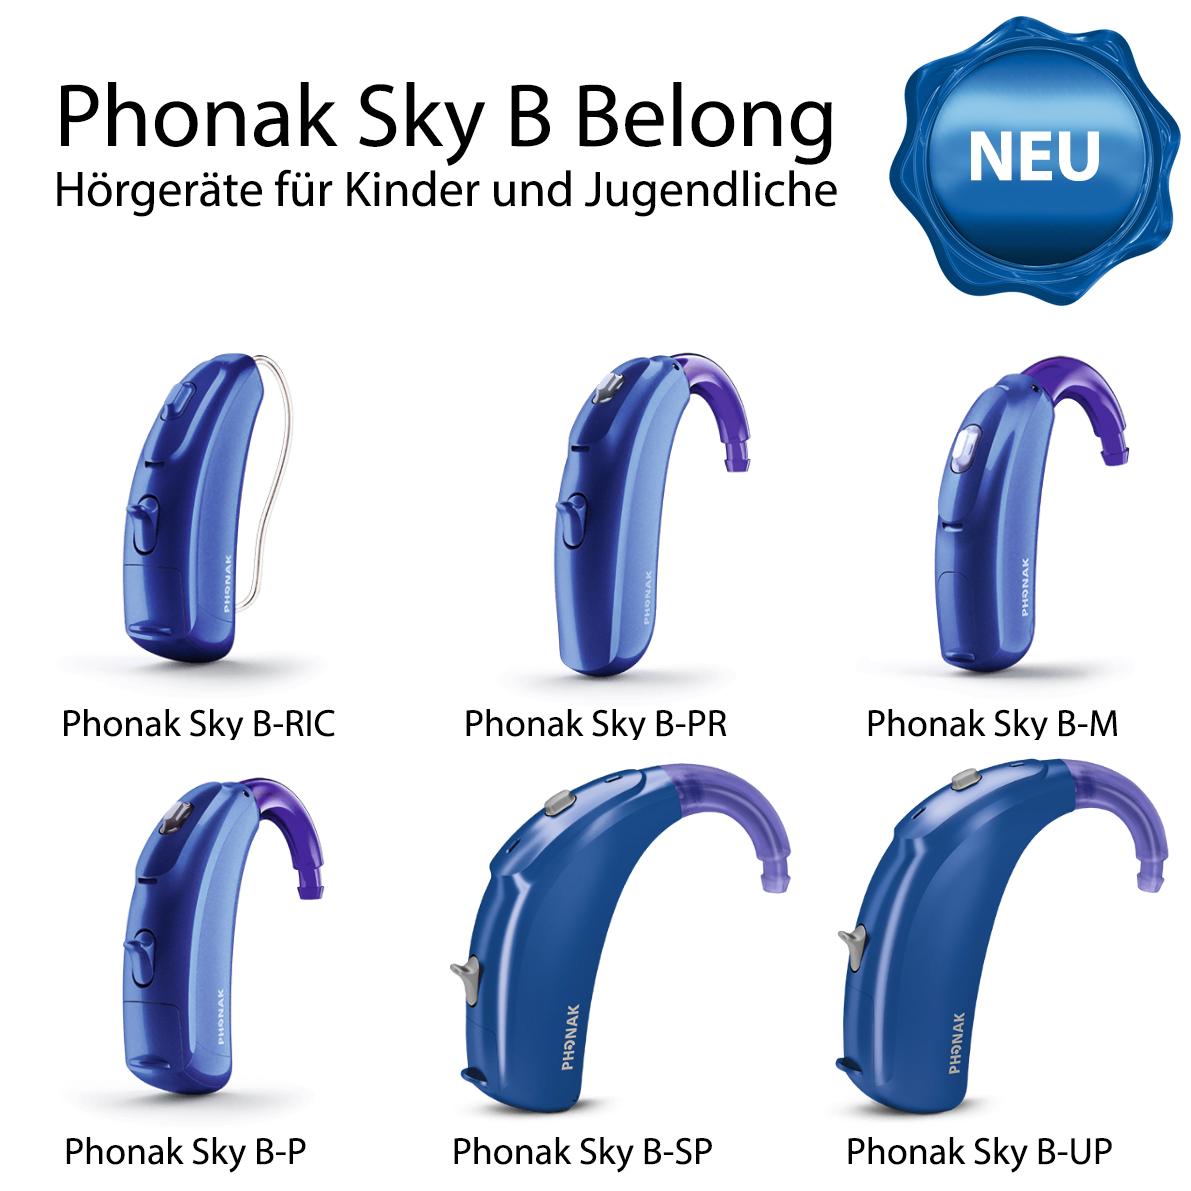 Phonak Preise